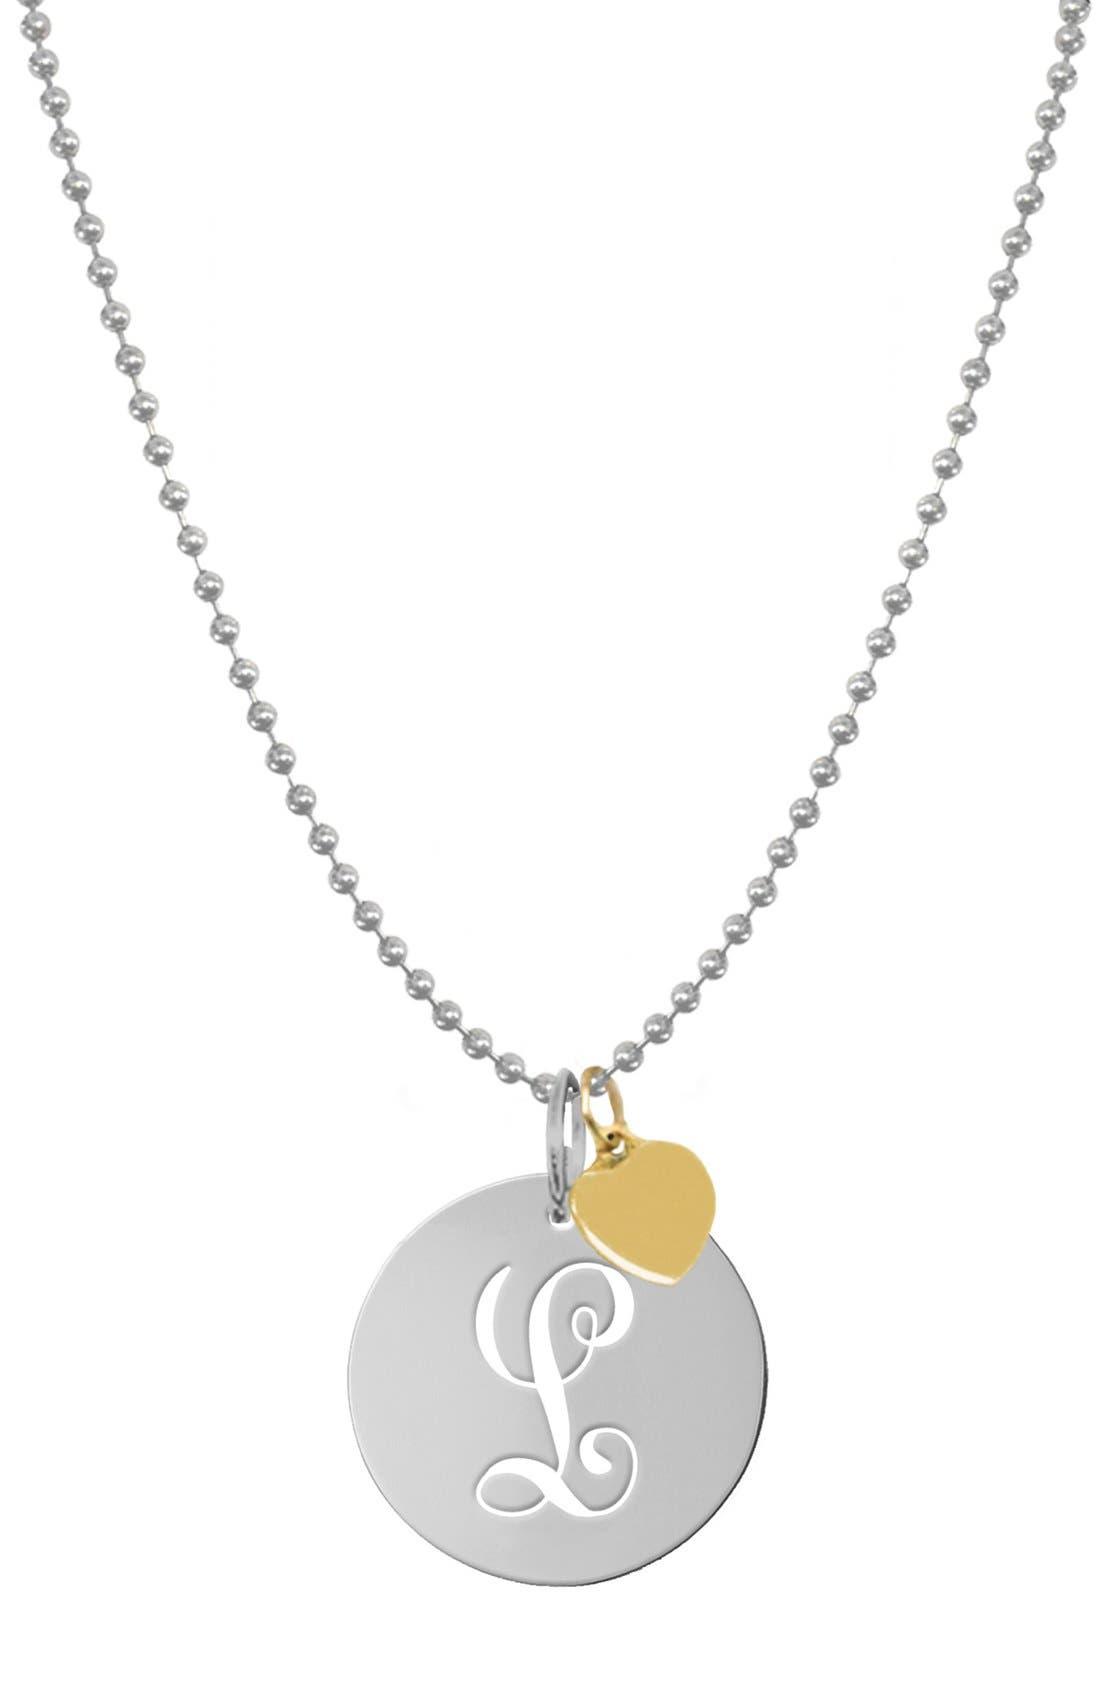 Personalized Script Initial Disc Pendant Necklace,                         Main,                         color, SILVER - L